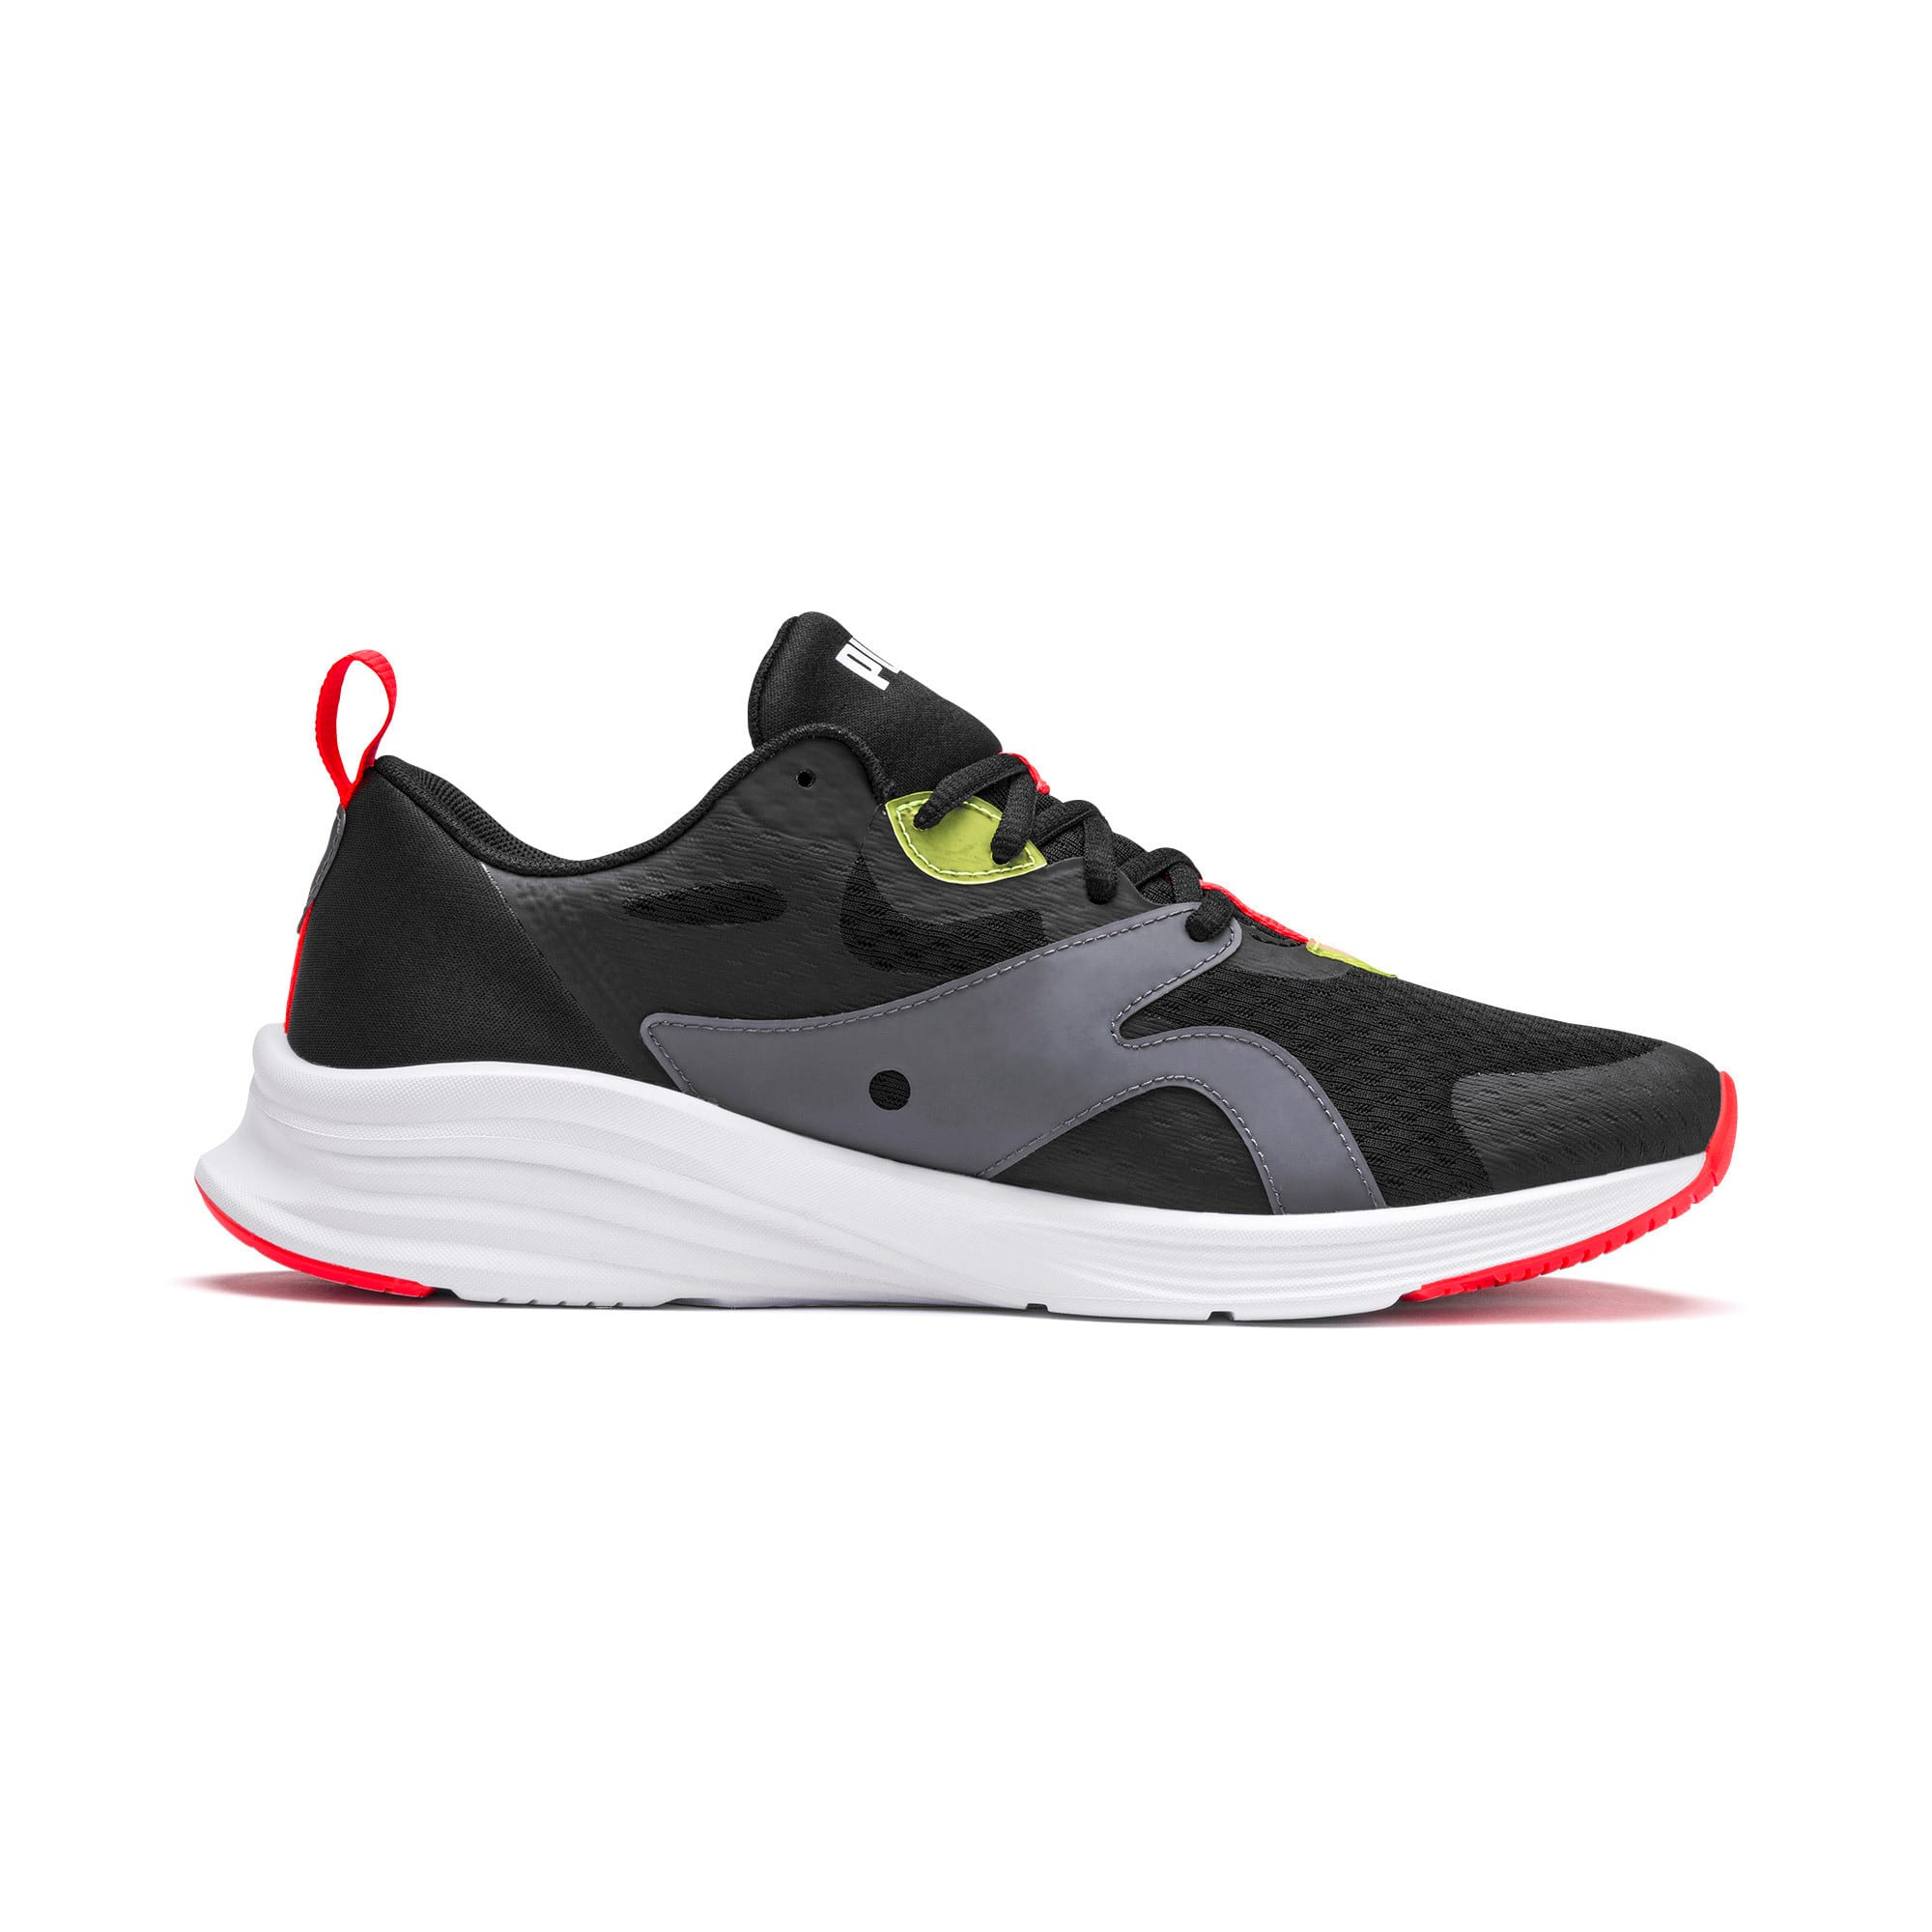 Thumbnail 5 of HYBRID Fuego Men's Running Shoes, Puma Black-Yellow Alert, medium